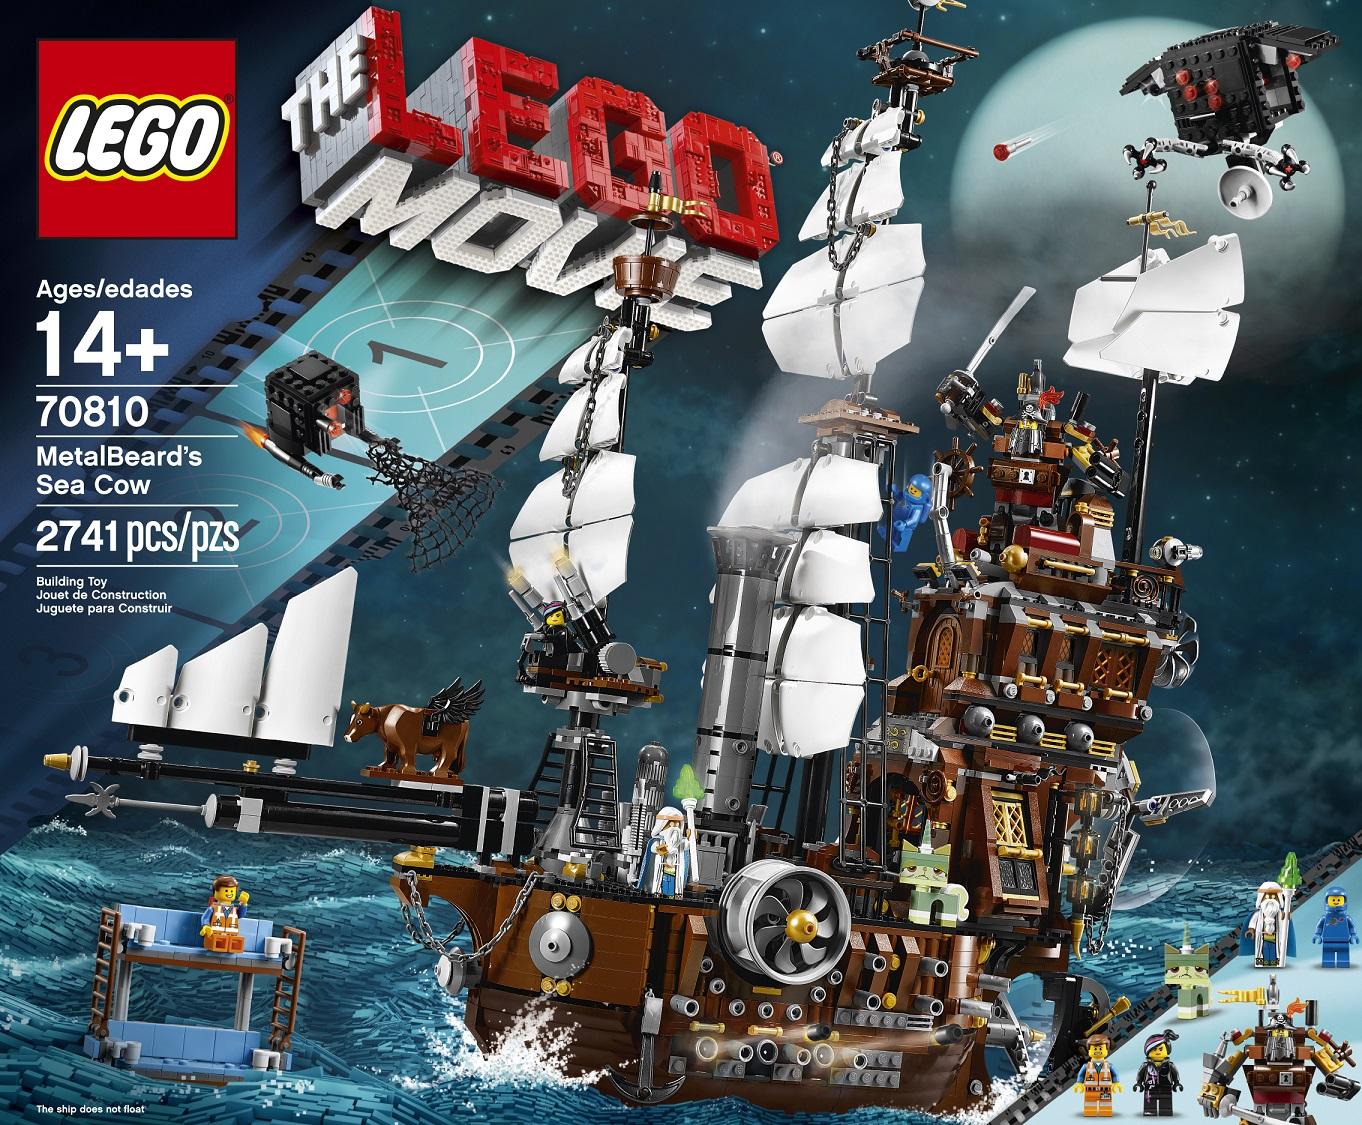 Lego Movie Toys : Toys n bricks lego news site sales deals reviews